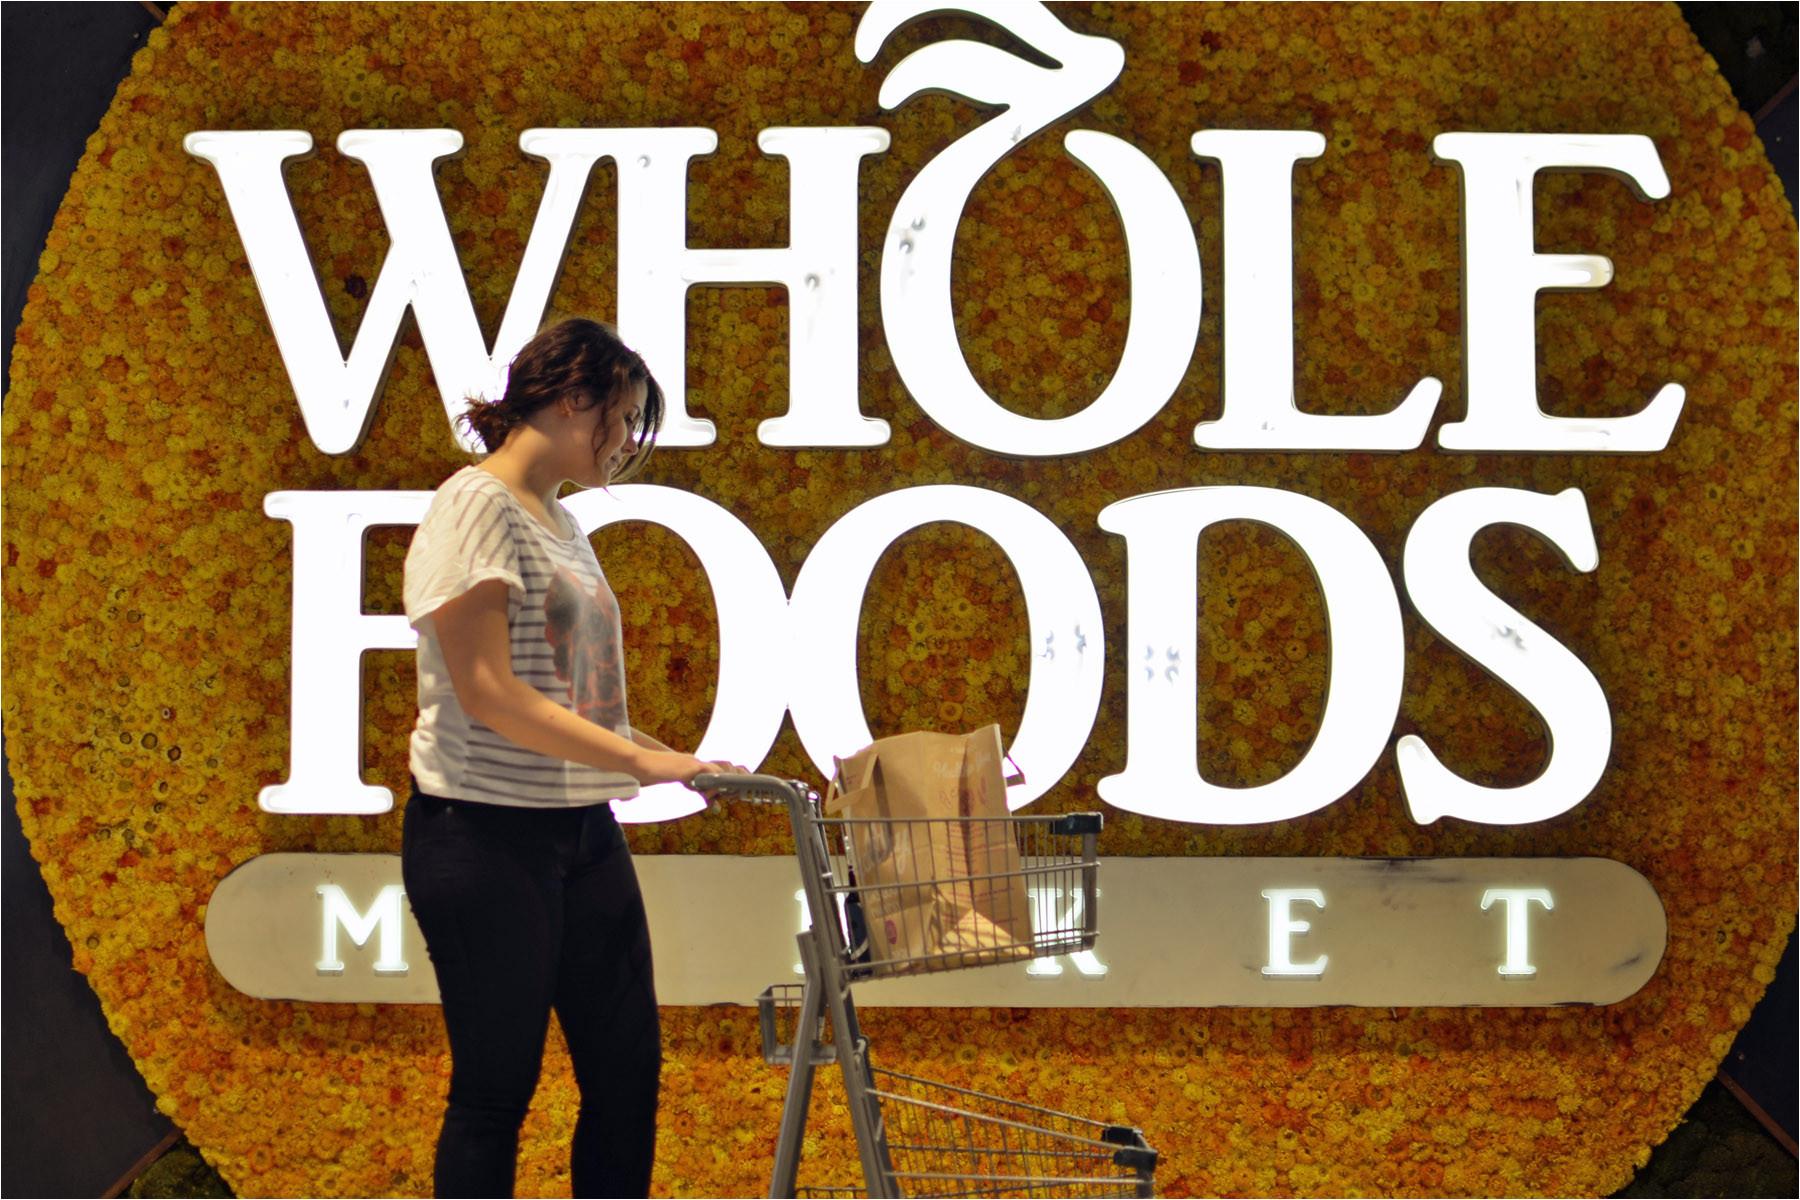 wfm store logo with shopper jpg